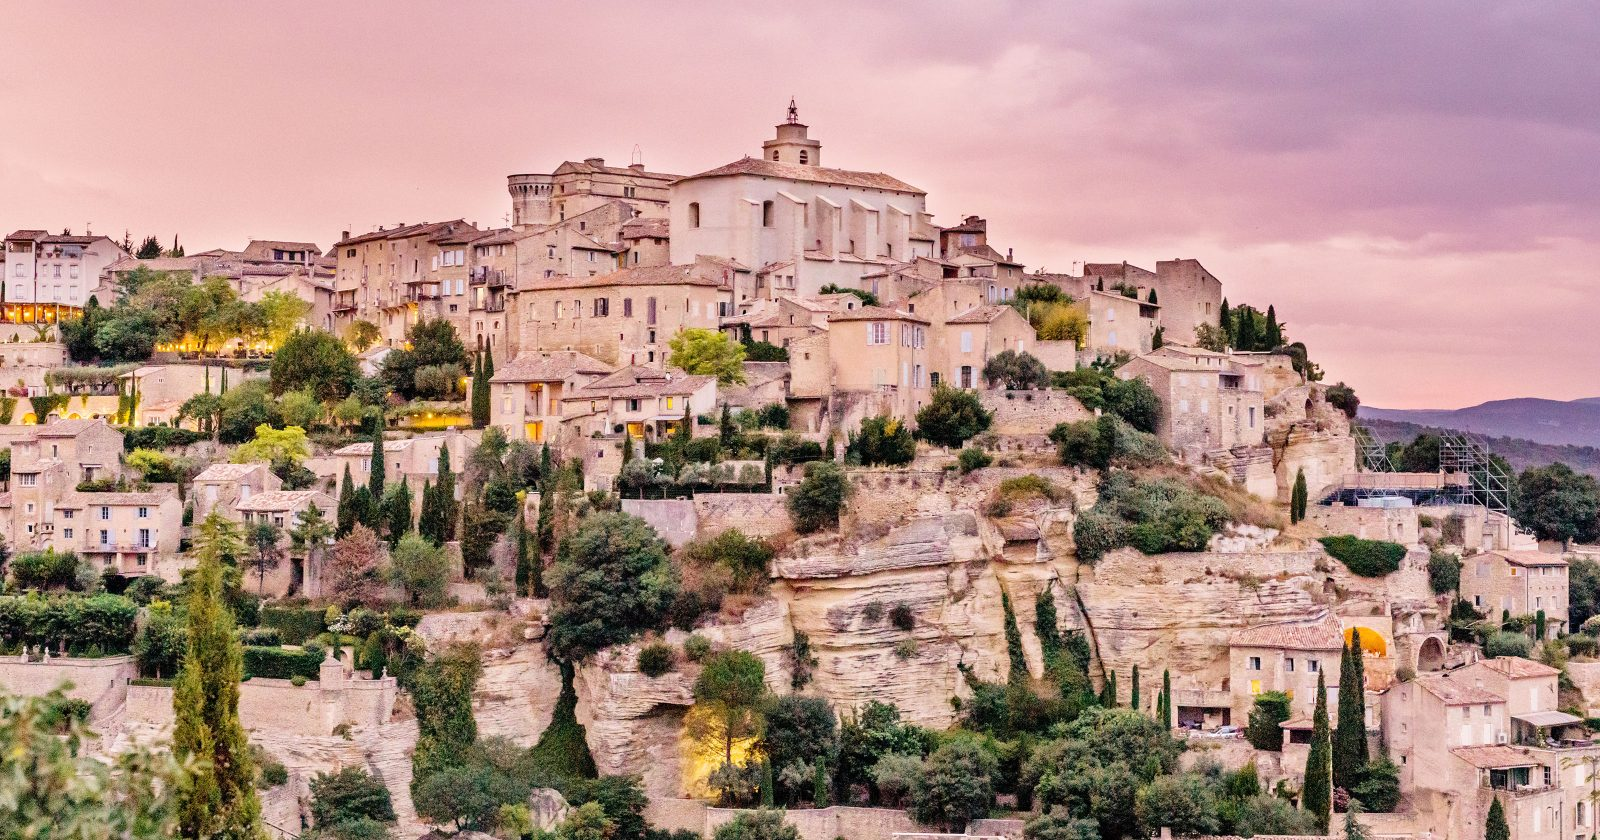 Provence, France: Part 2